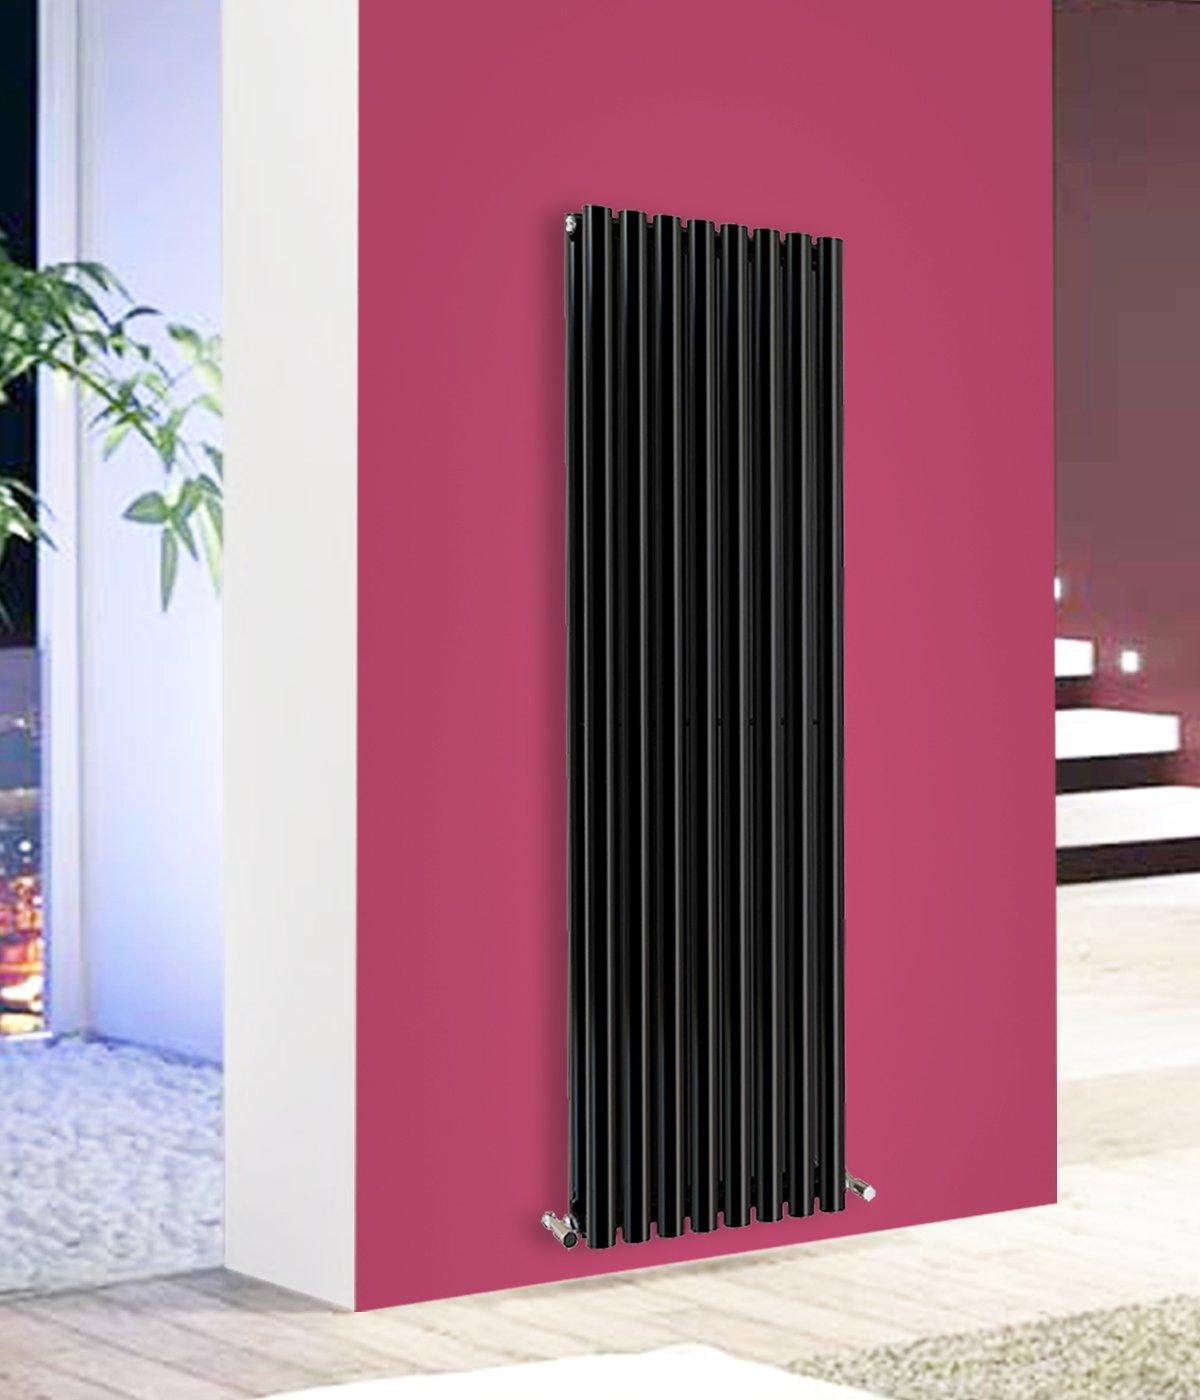 Nrg modern vertical column designer radiator black 1600x472 oval double panel home livingroom bedroom bathroom heater amazon co uk diy tools